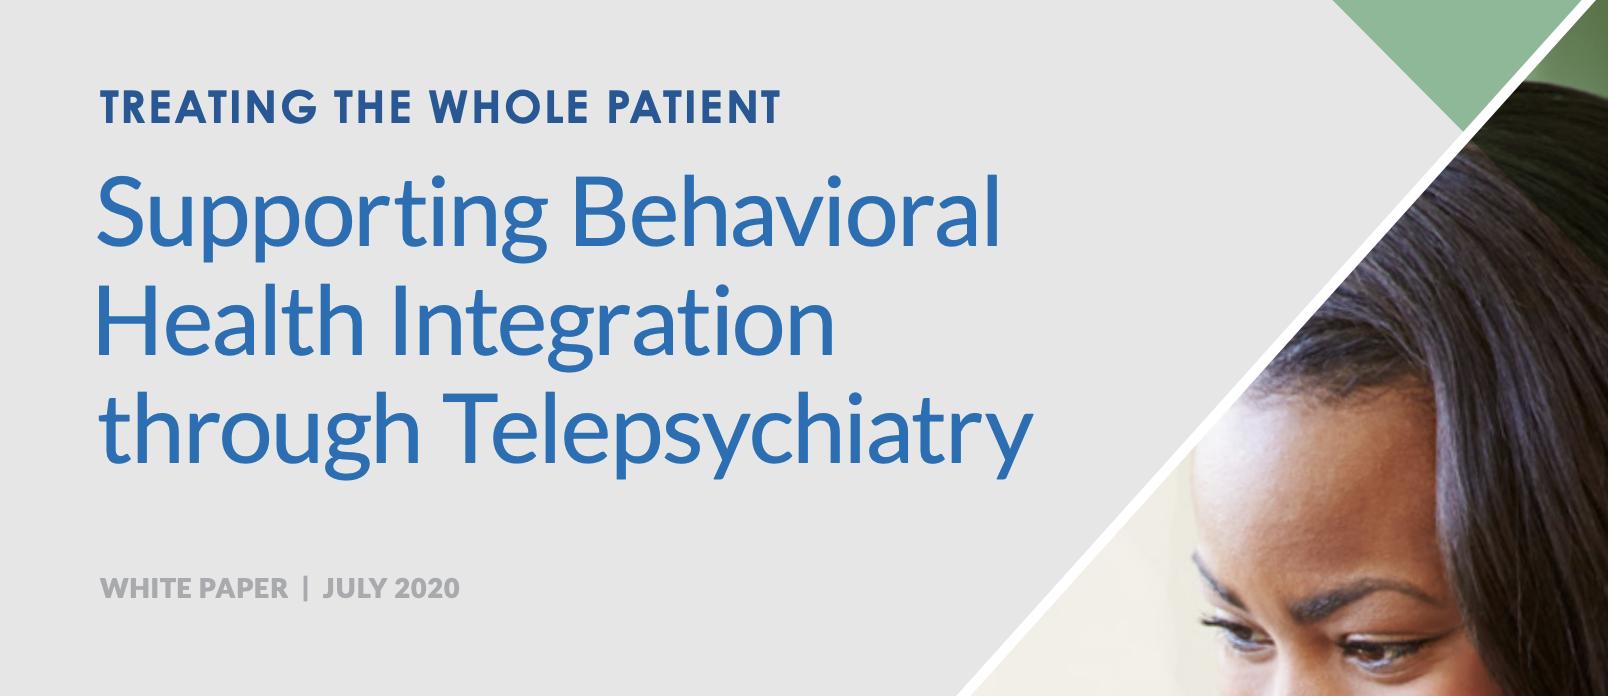 Supporting-Behavioral-Health_integration